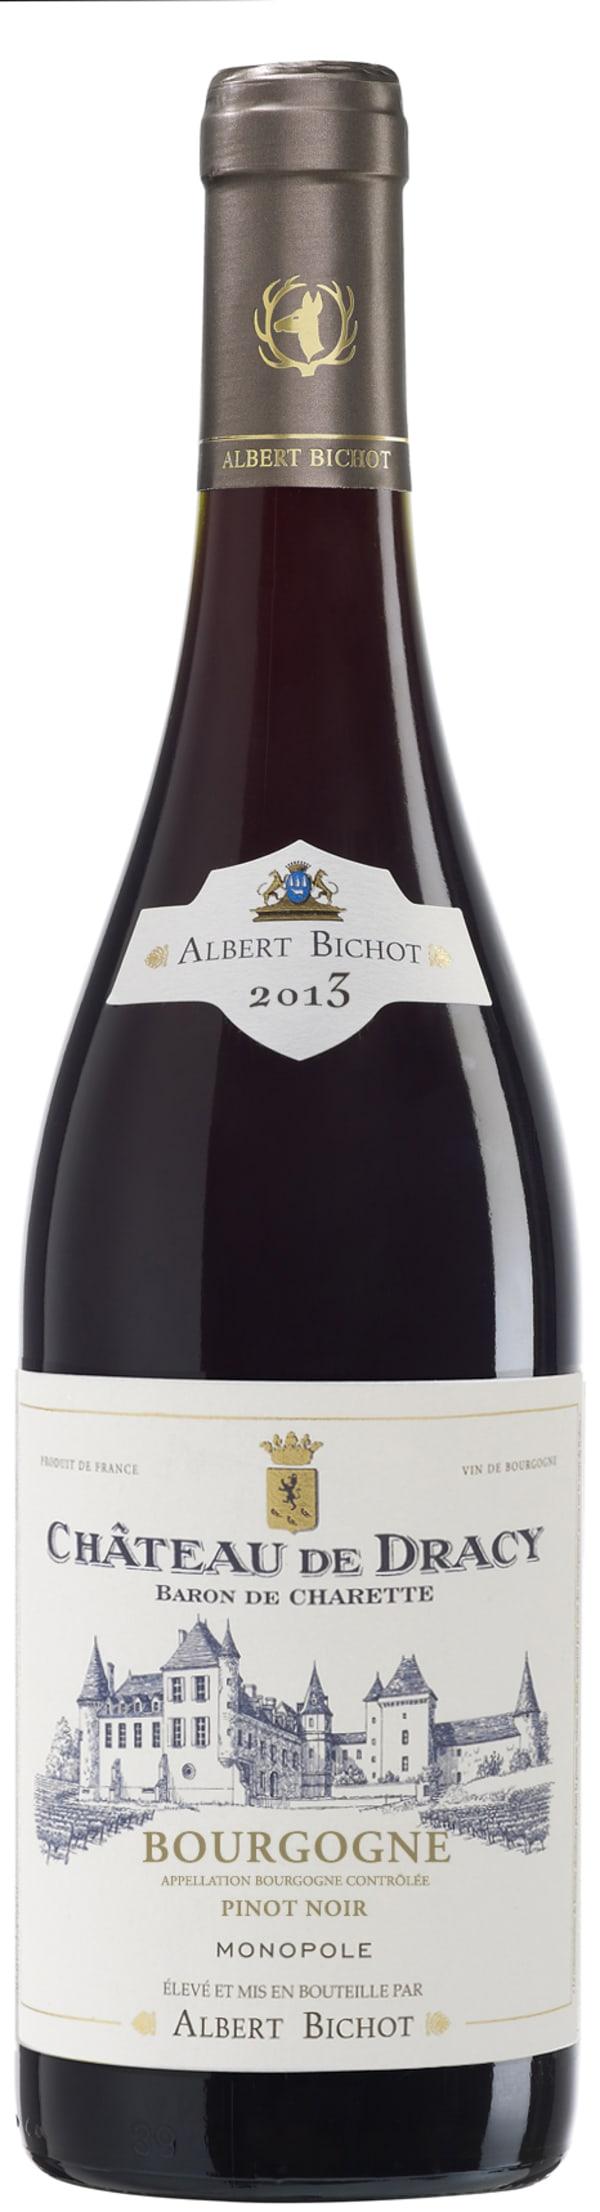 Château de Dracy Pinot Noir 2013